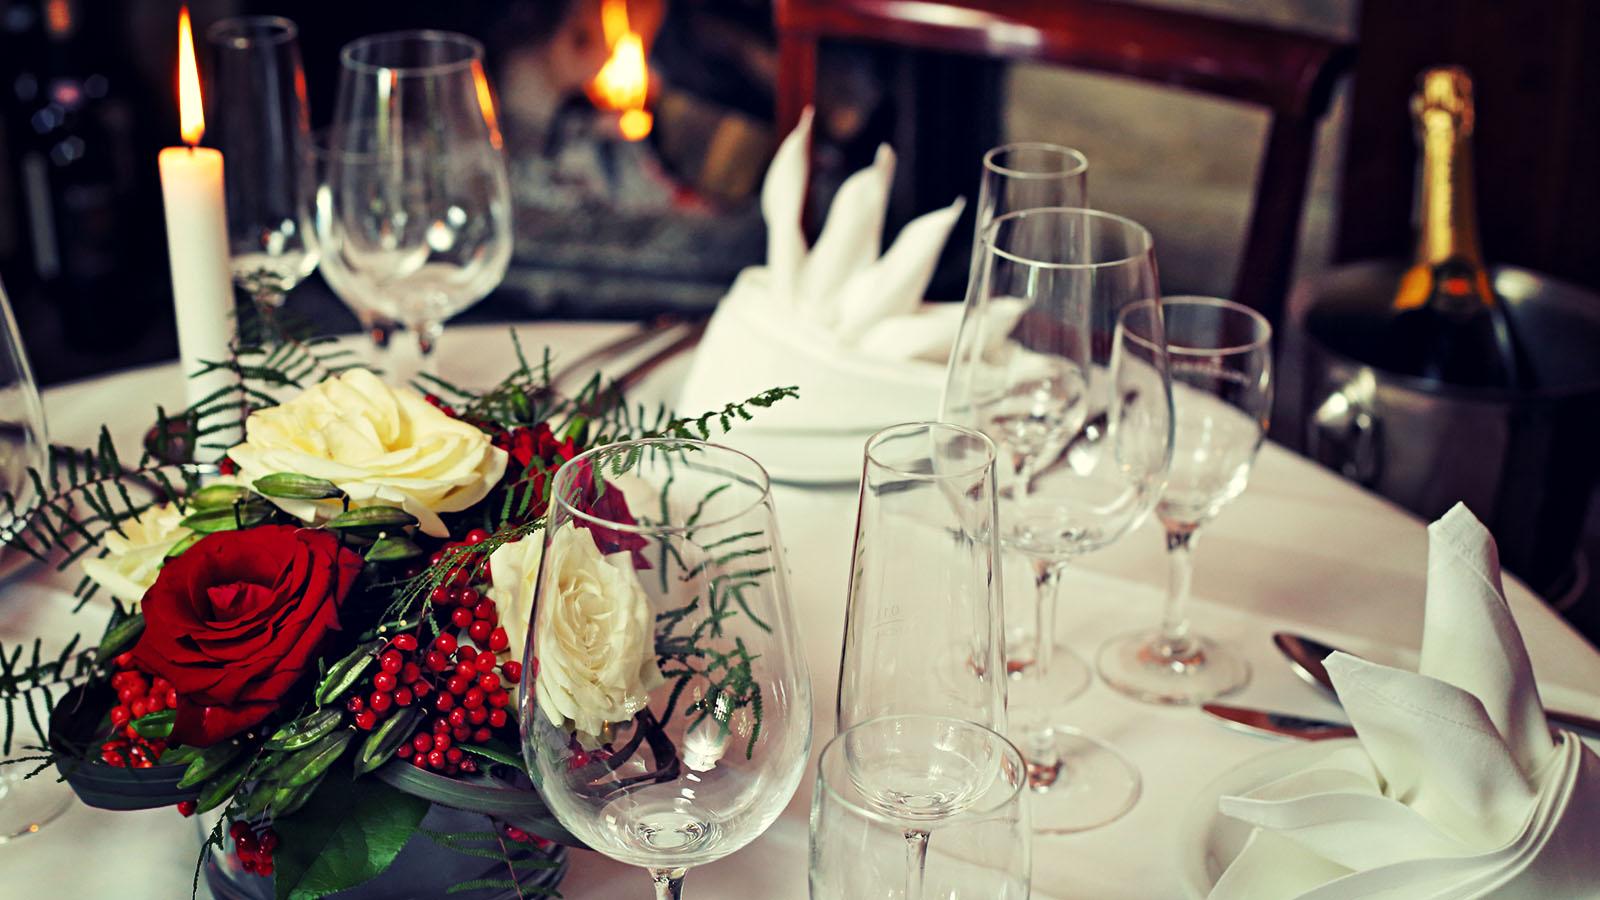 il-castello-berlin-buch-restaurant-eventlocation-pension-sllider5